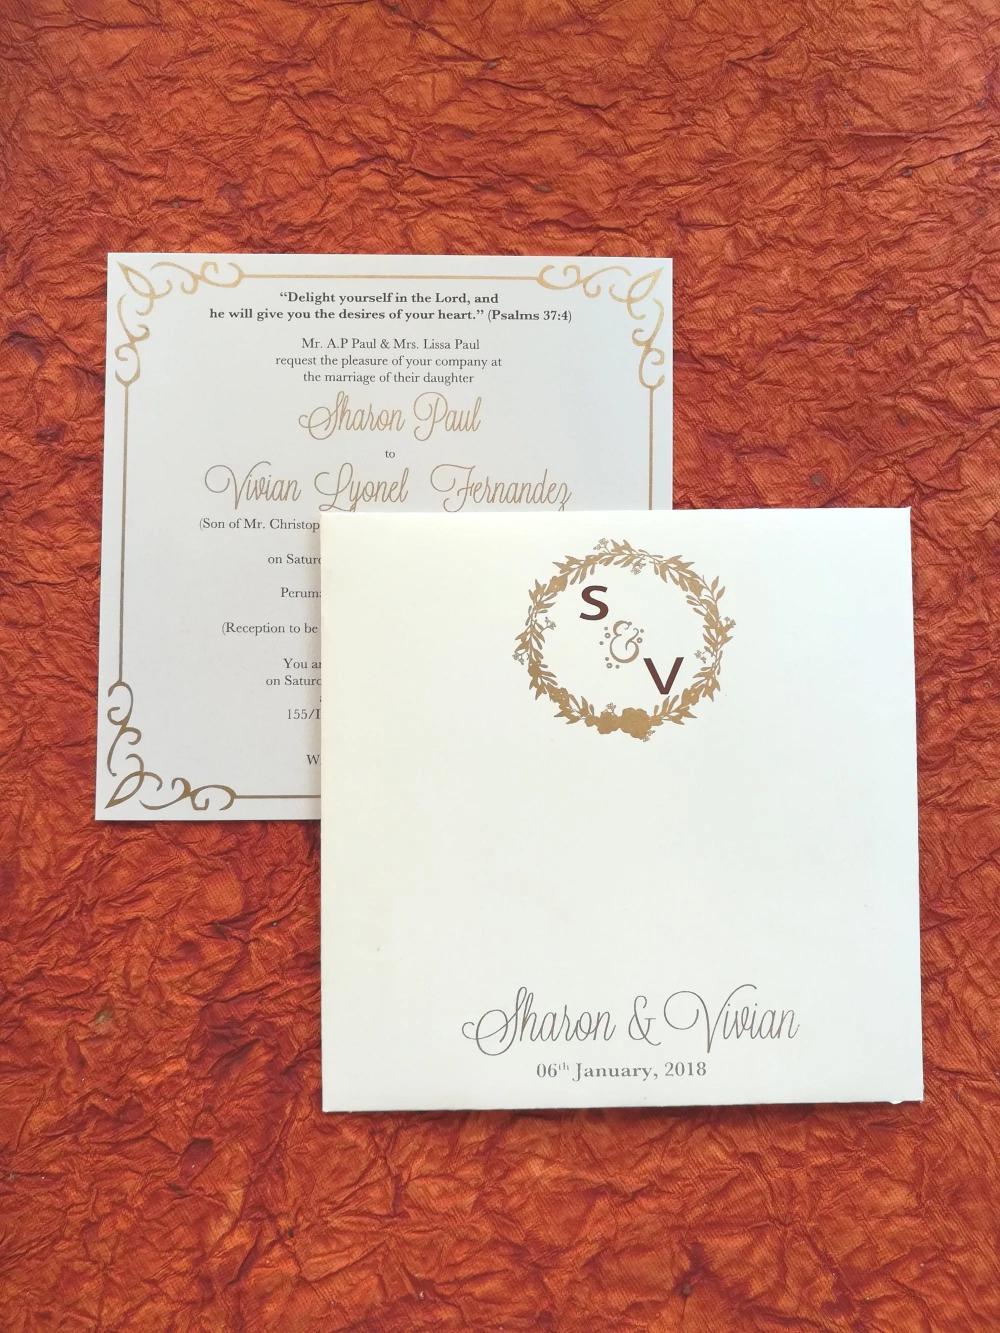 Wedding Invitation Lovely Wedding Invitation Cards In India Superb Invitation Superb Invitation